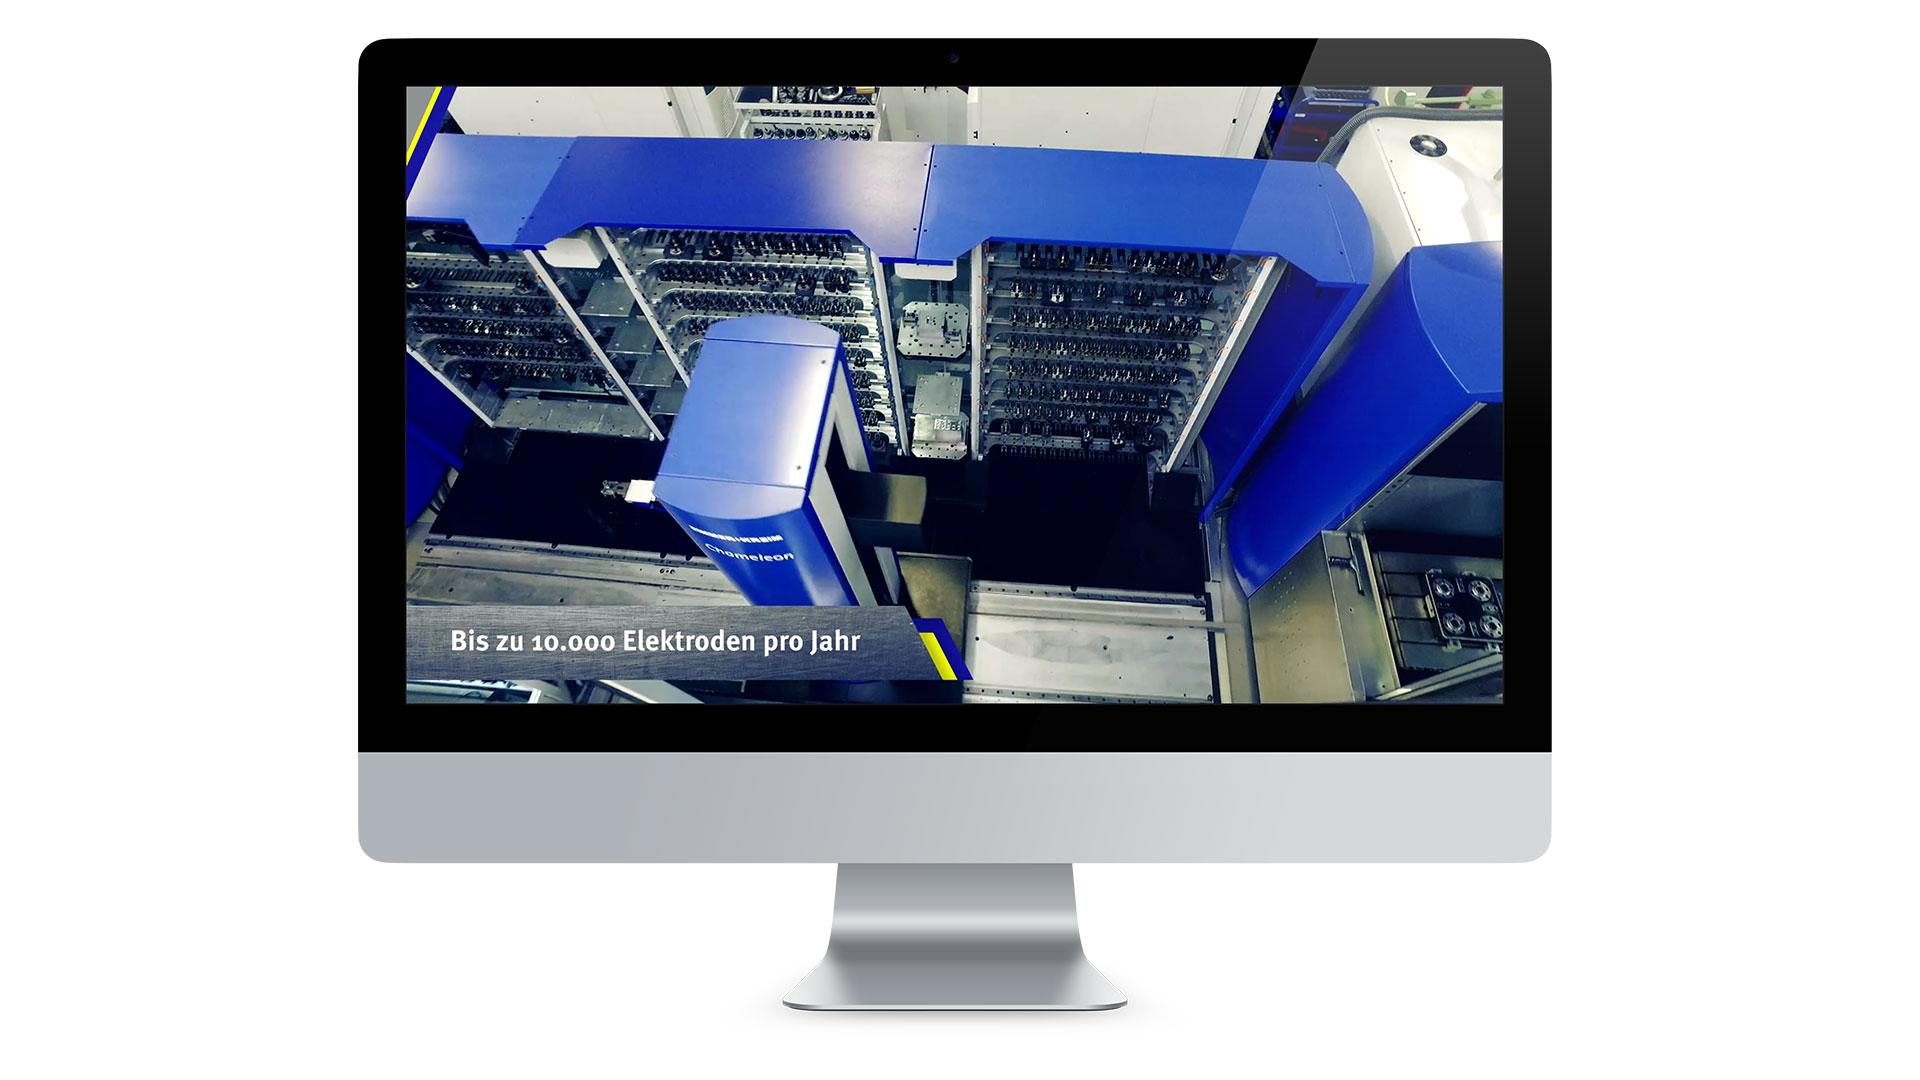 VMR GmbH & Co. KG